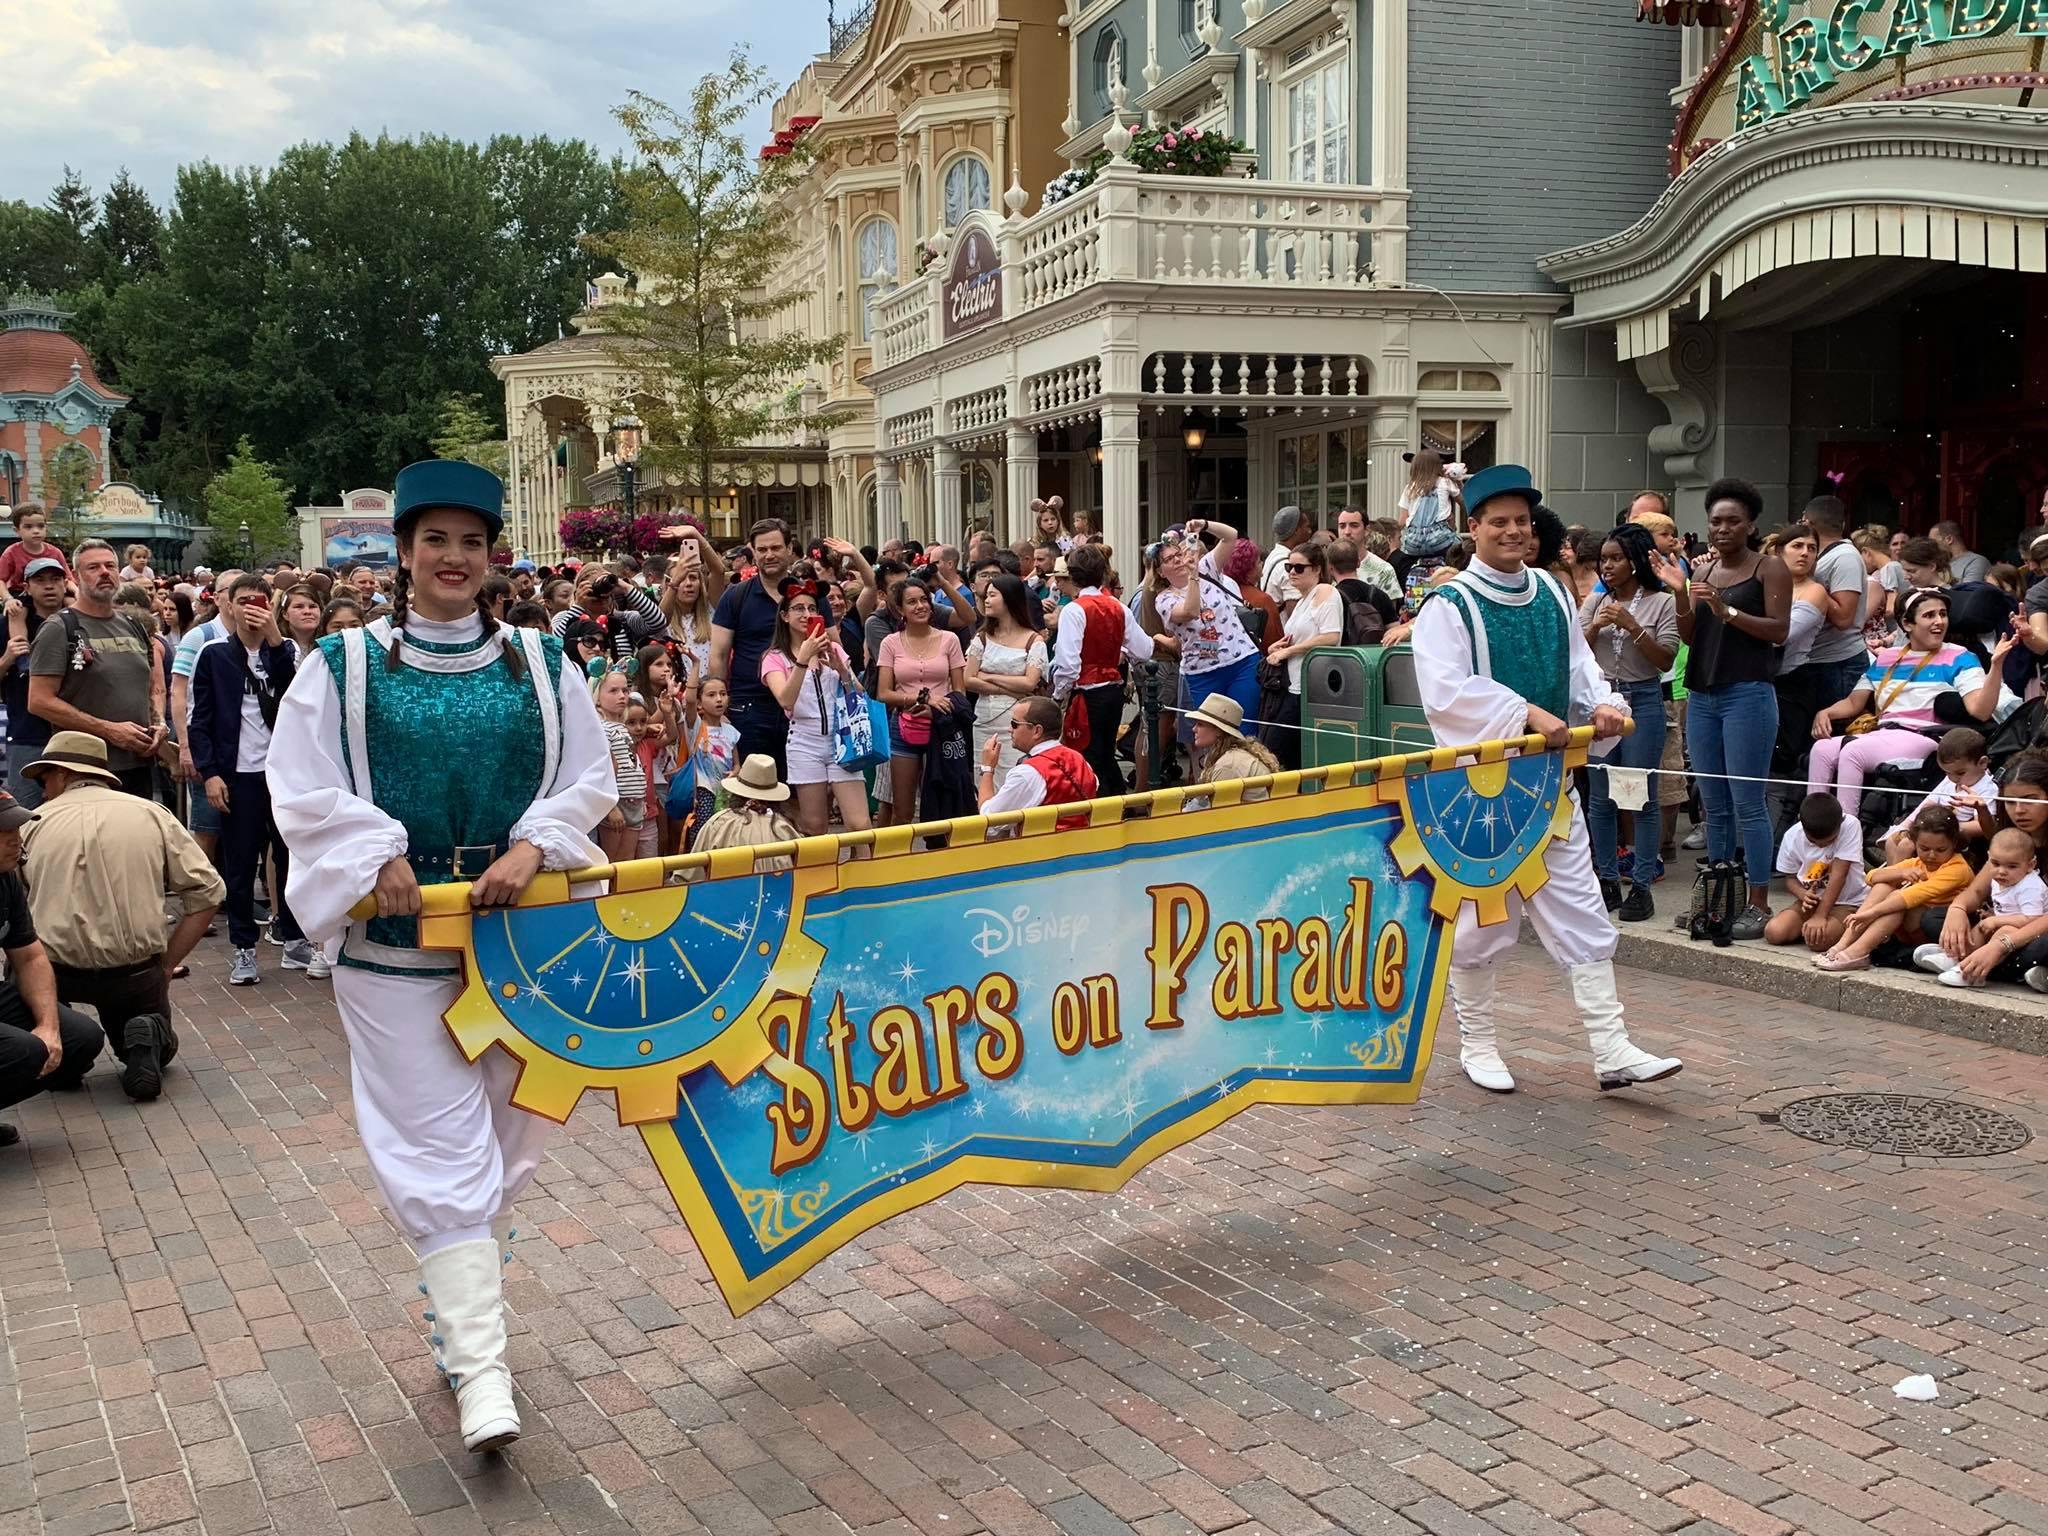 Ambasciatori Disneyland Paris 2019 - 2020 - Pagina 4 Parade10